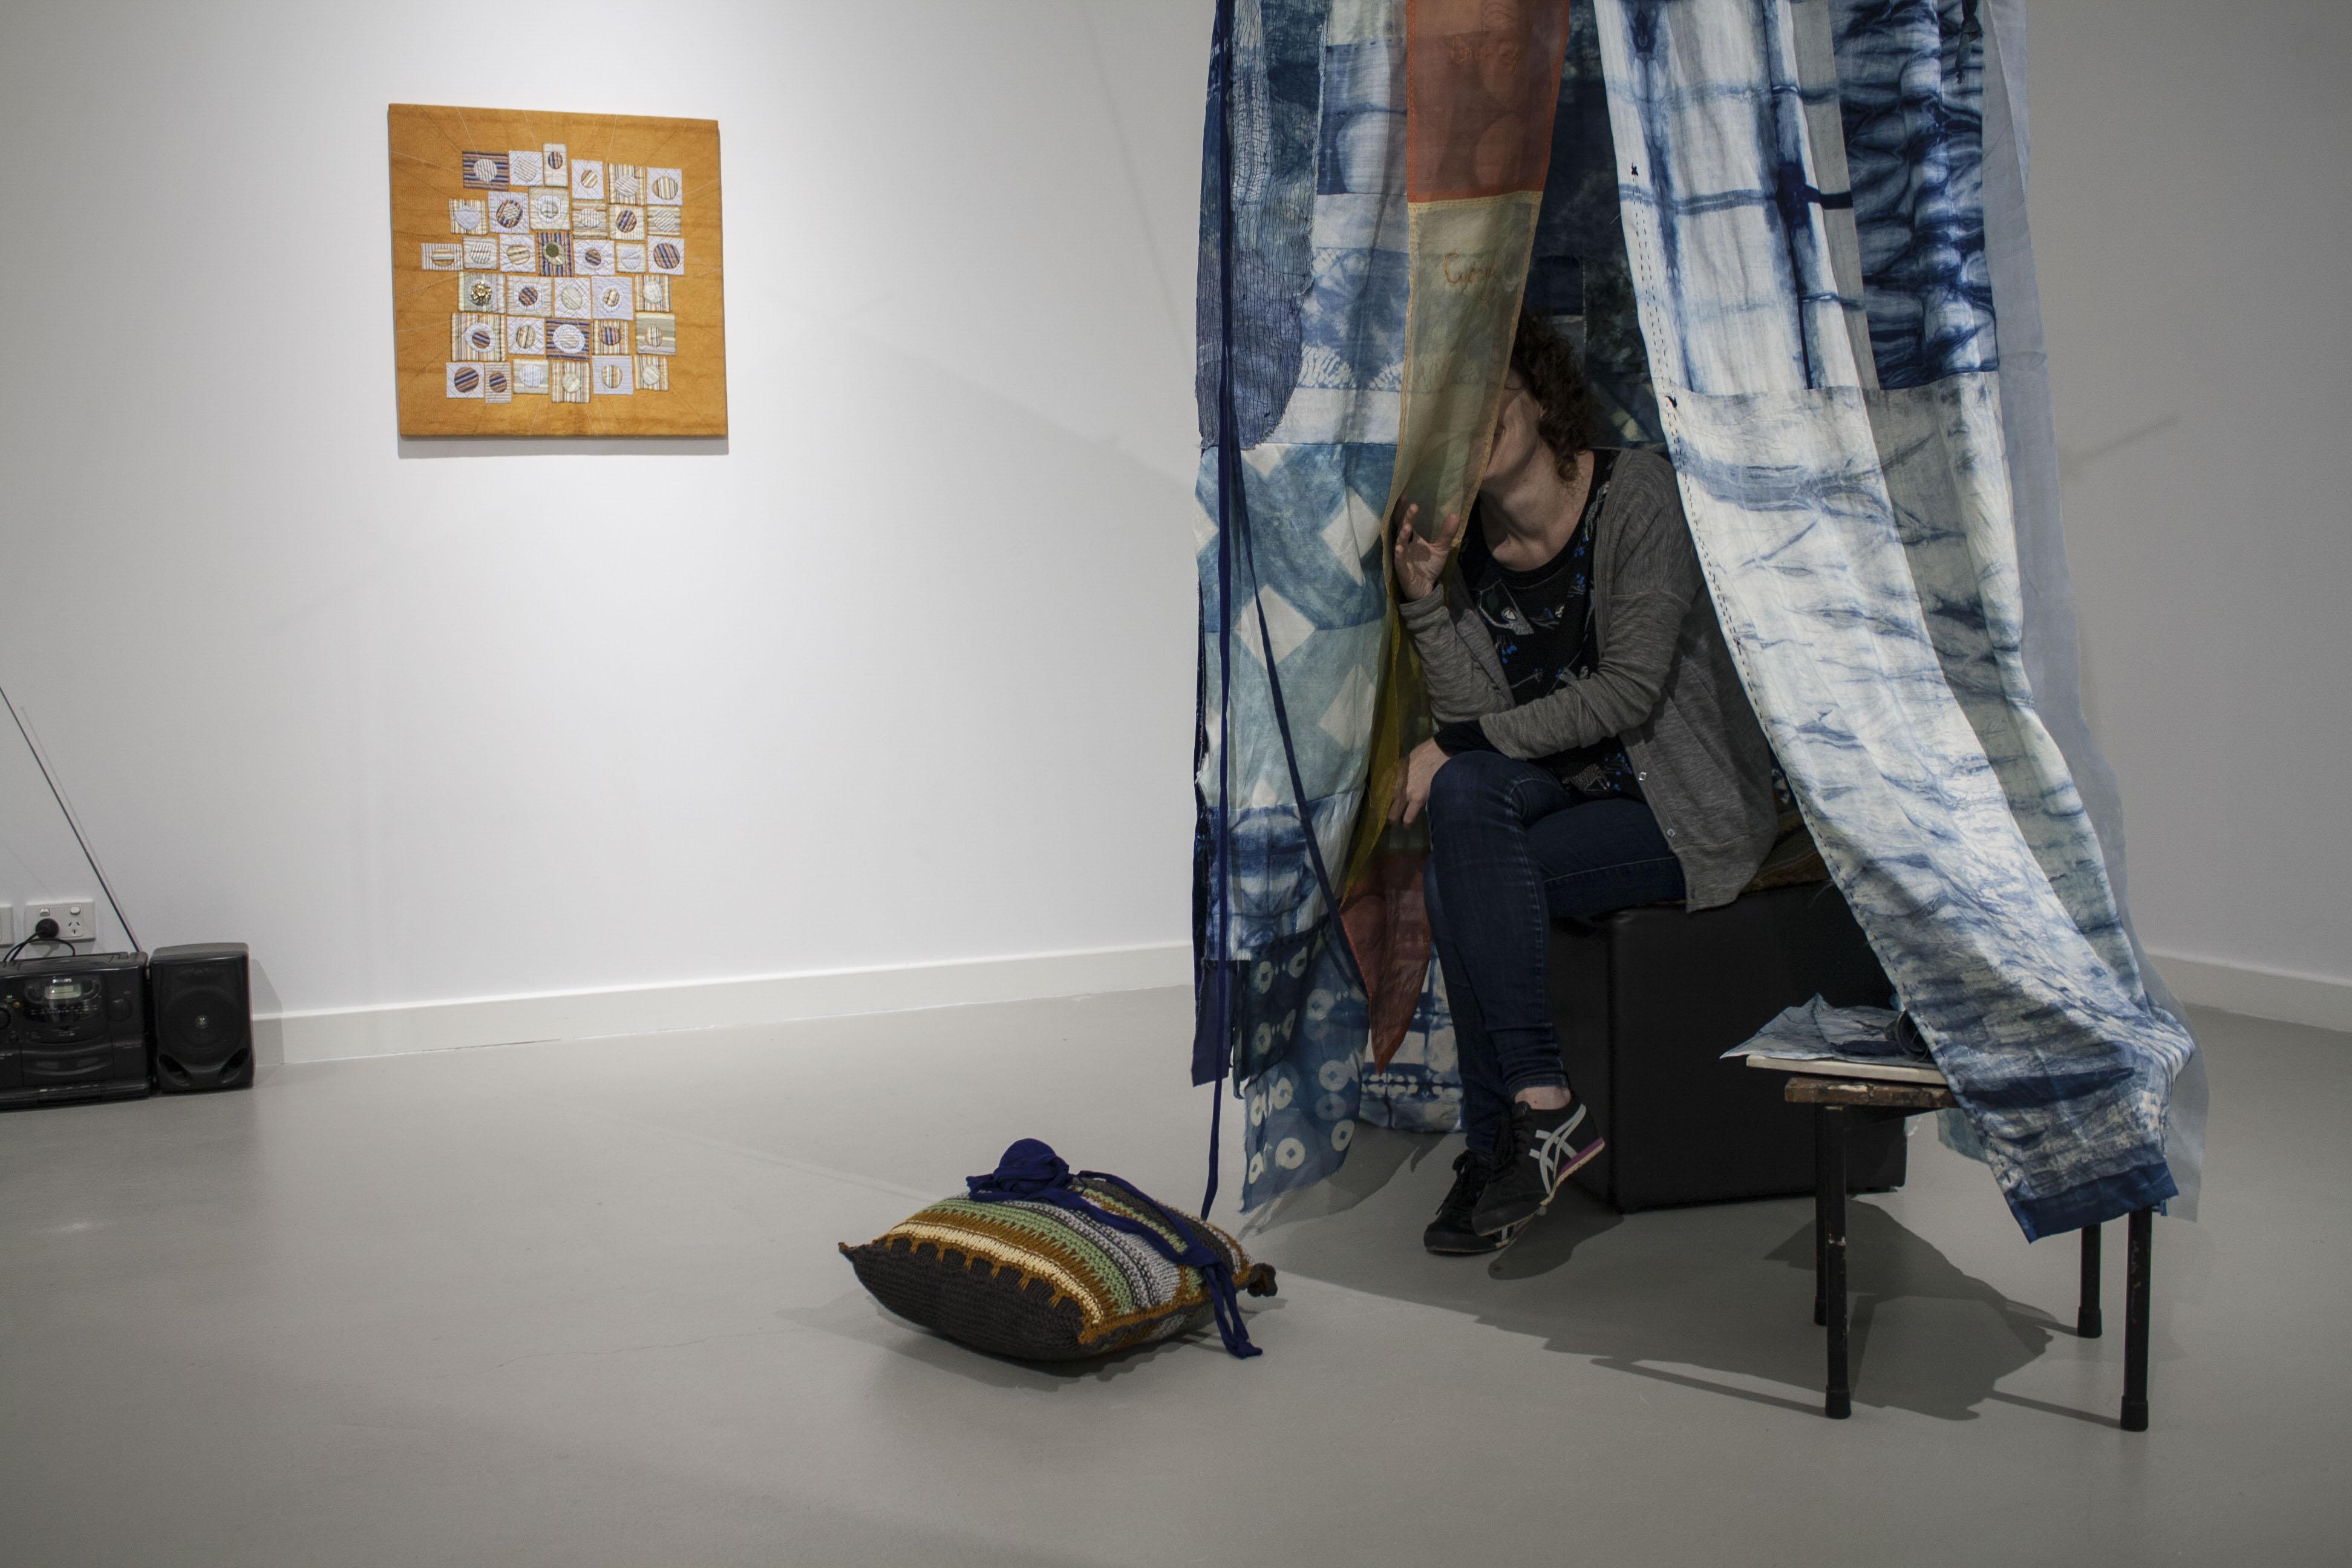 twentyONE+ artworks during set-up by Janie Matthews, Trudi Pollard